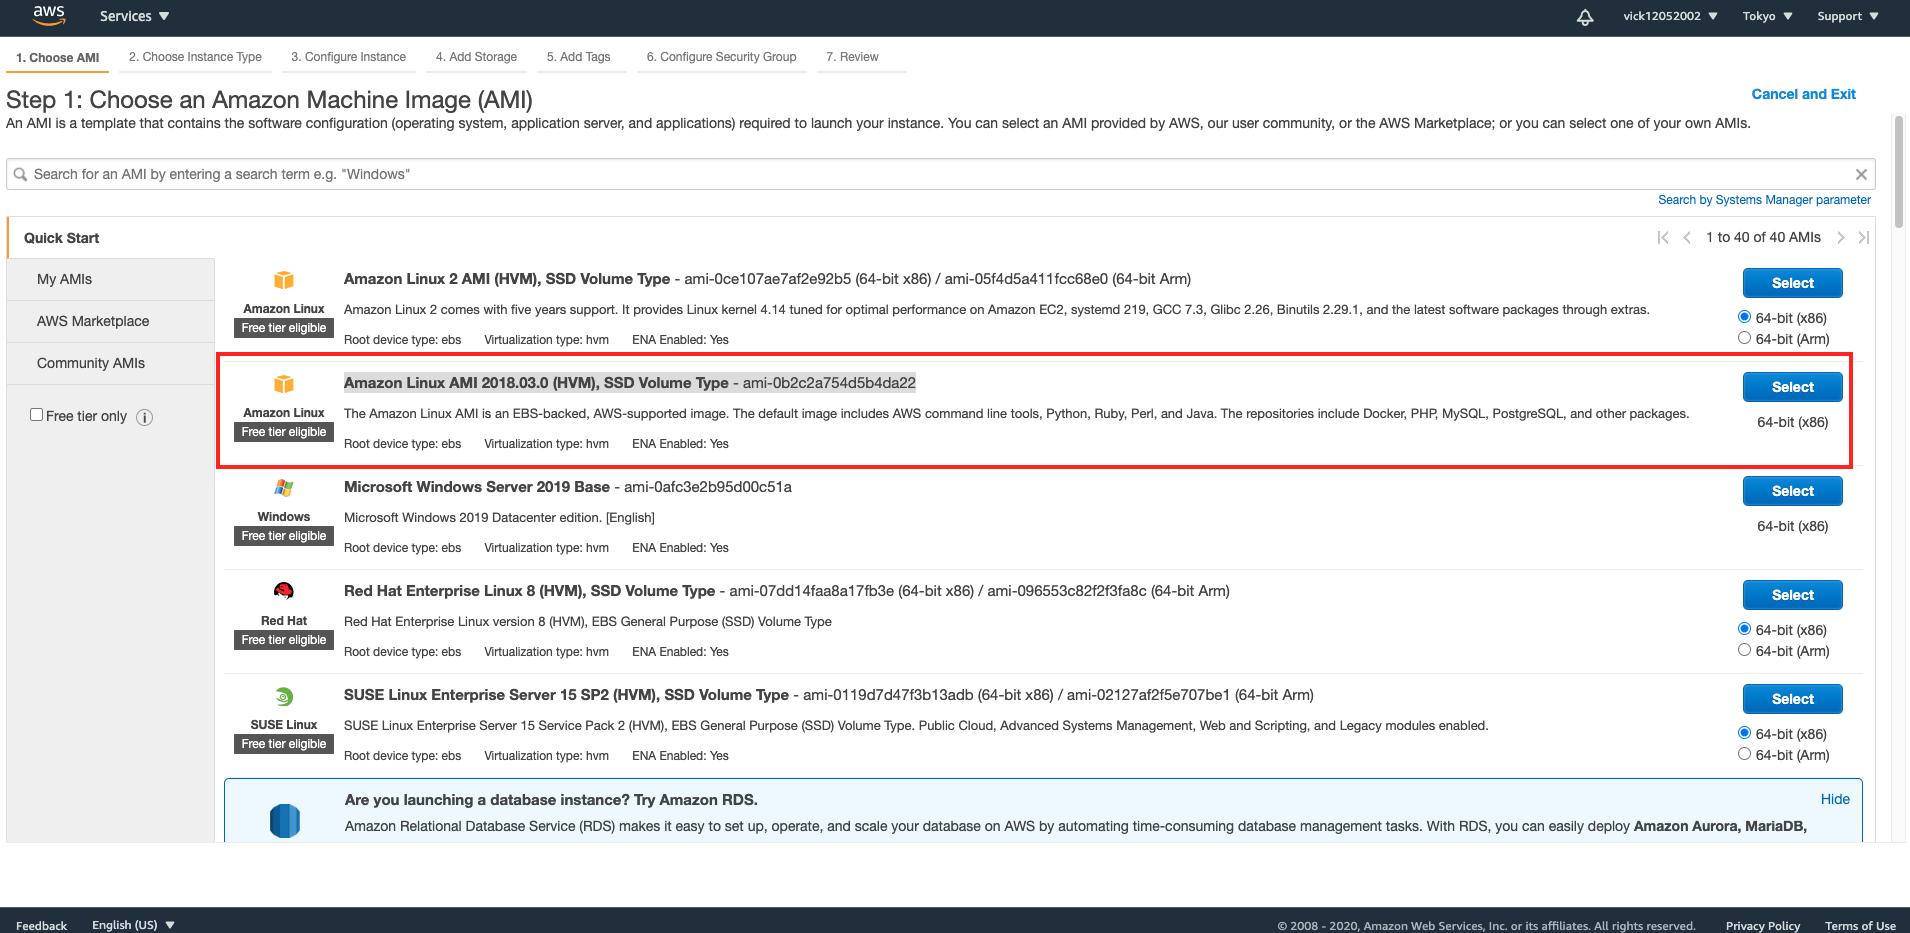 選擇伺服器-Amazon Linux AMI 2018.03.0 (HVM)